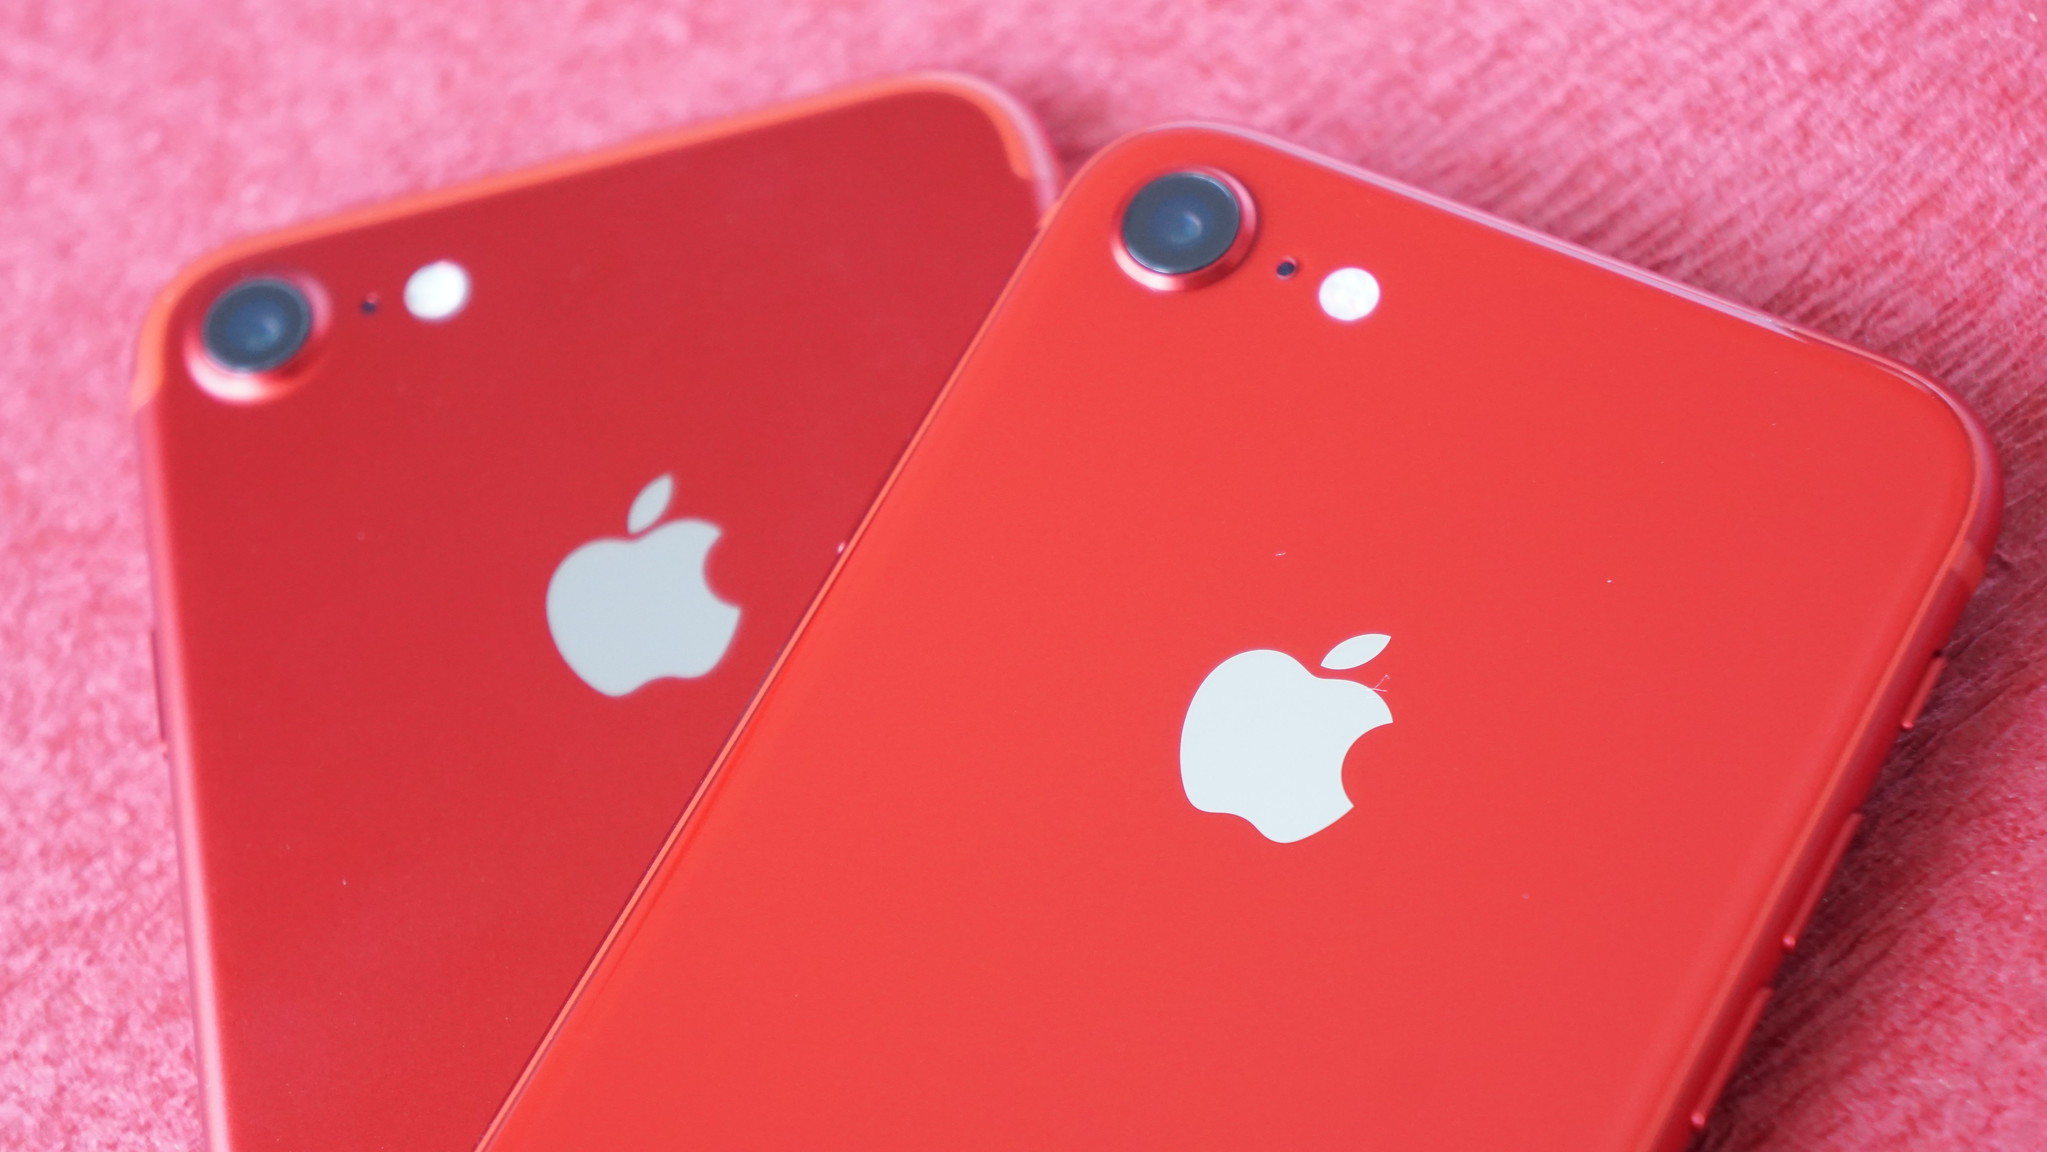 iPhone 9、早ければ明日発表?製品名は「iPhone SE」か